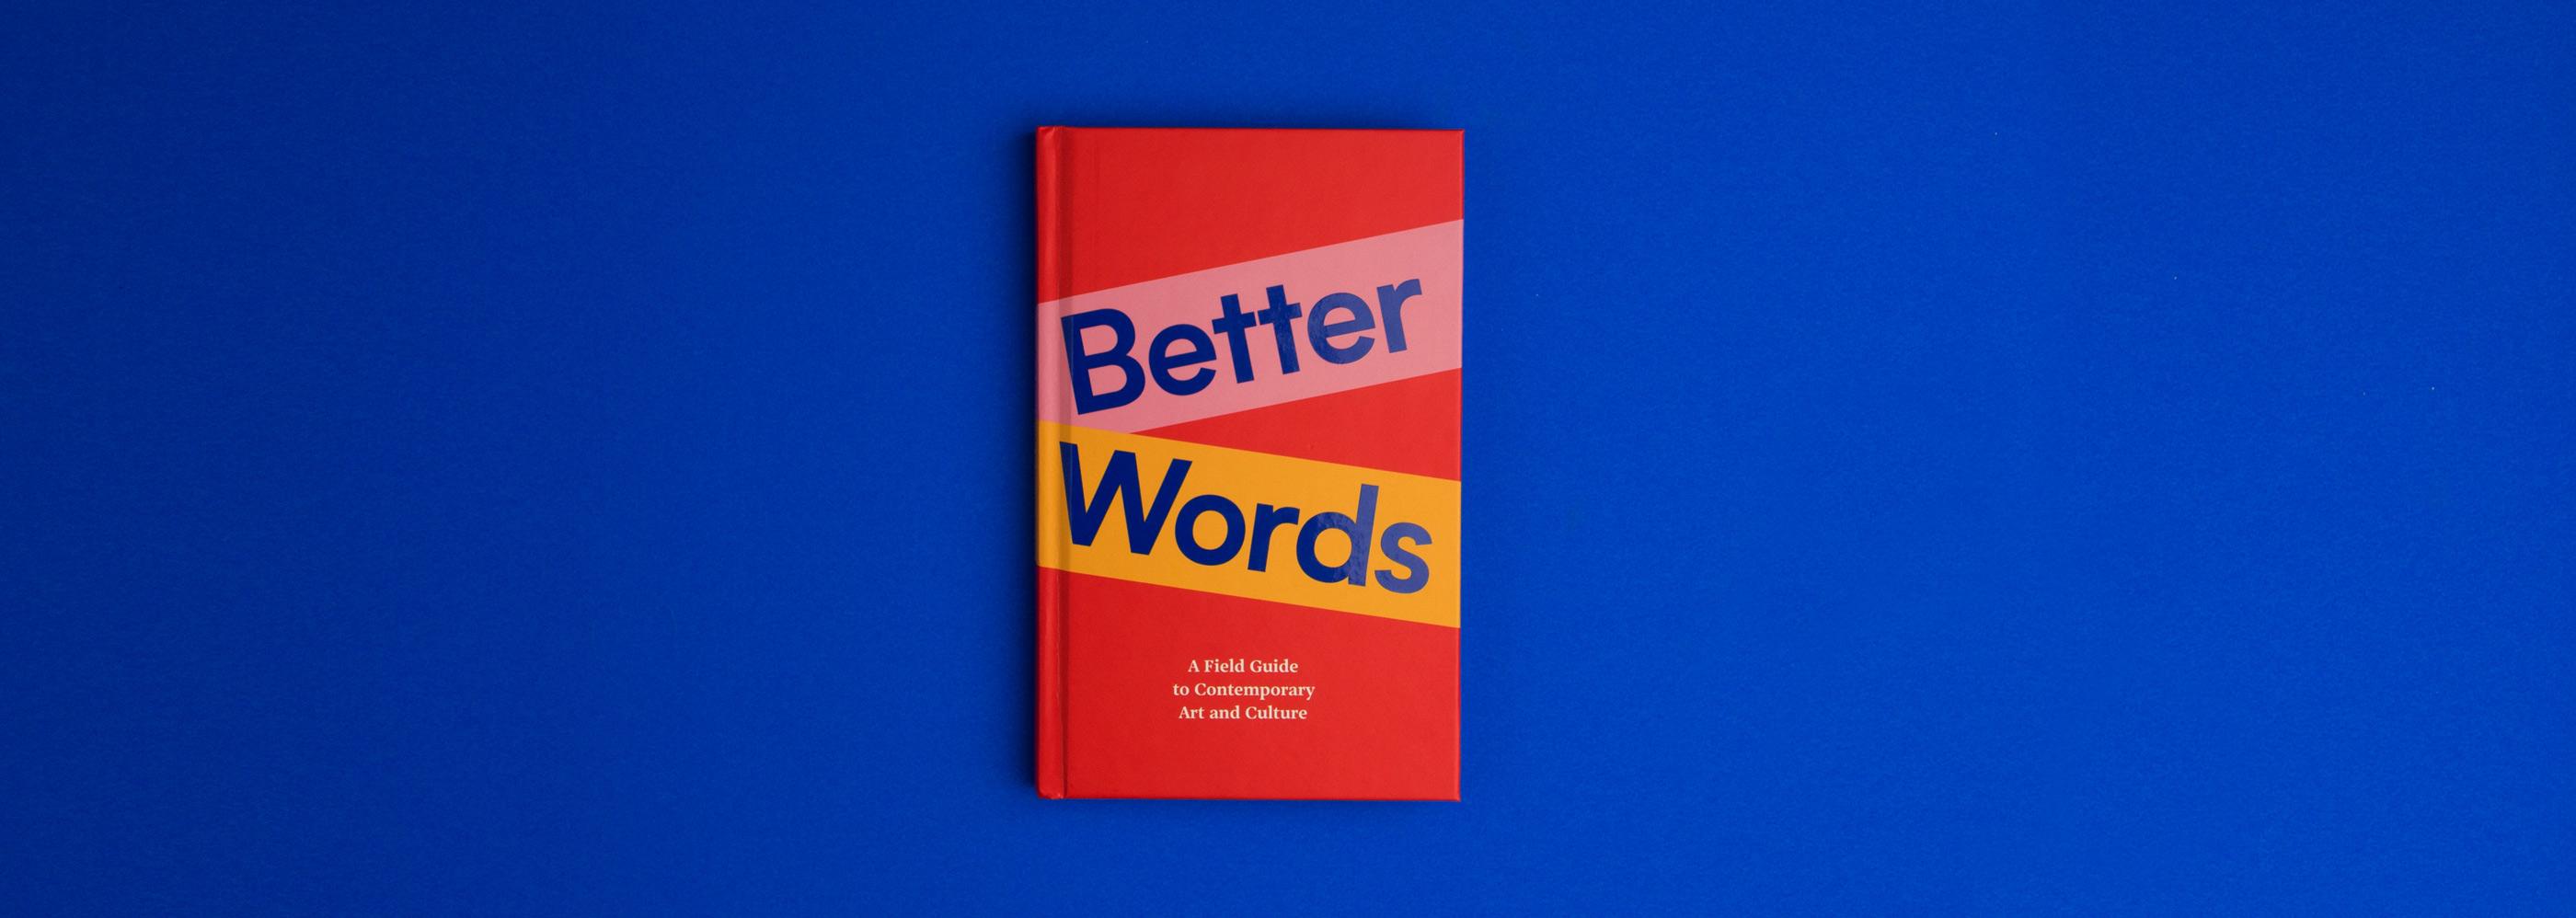 Better Words Eva International Book Design